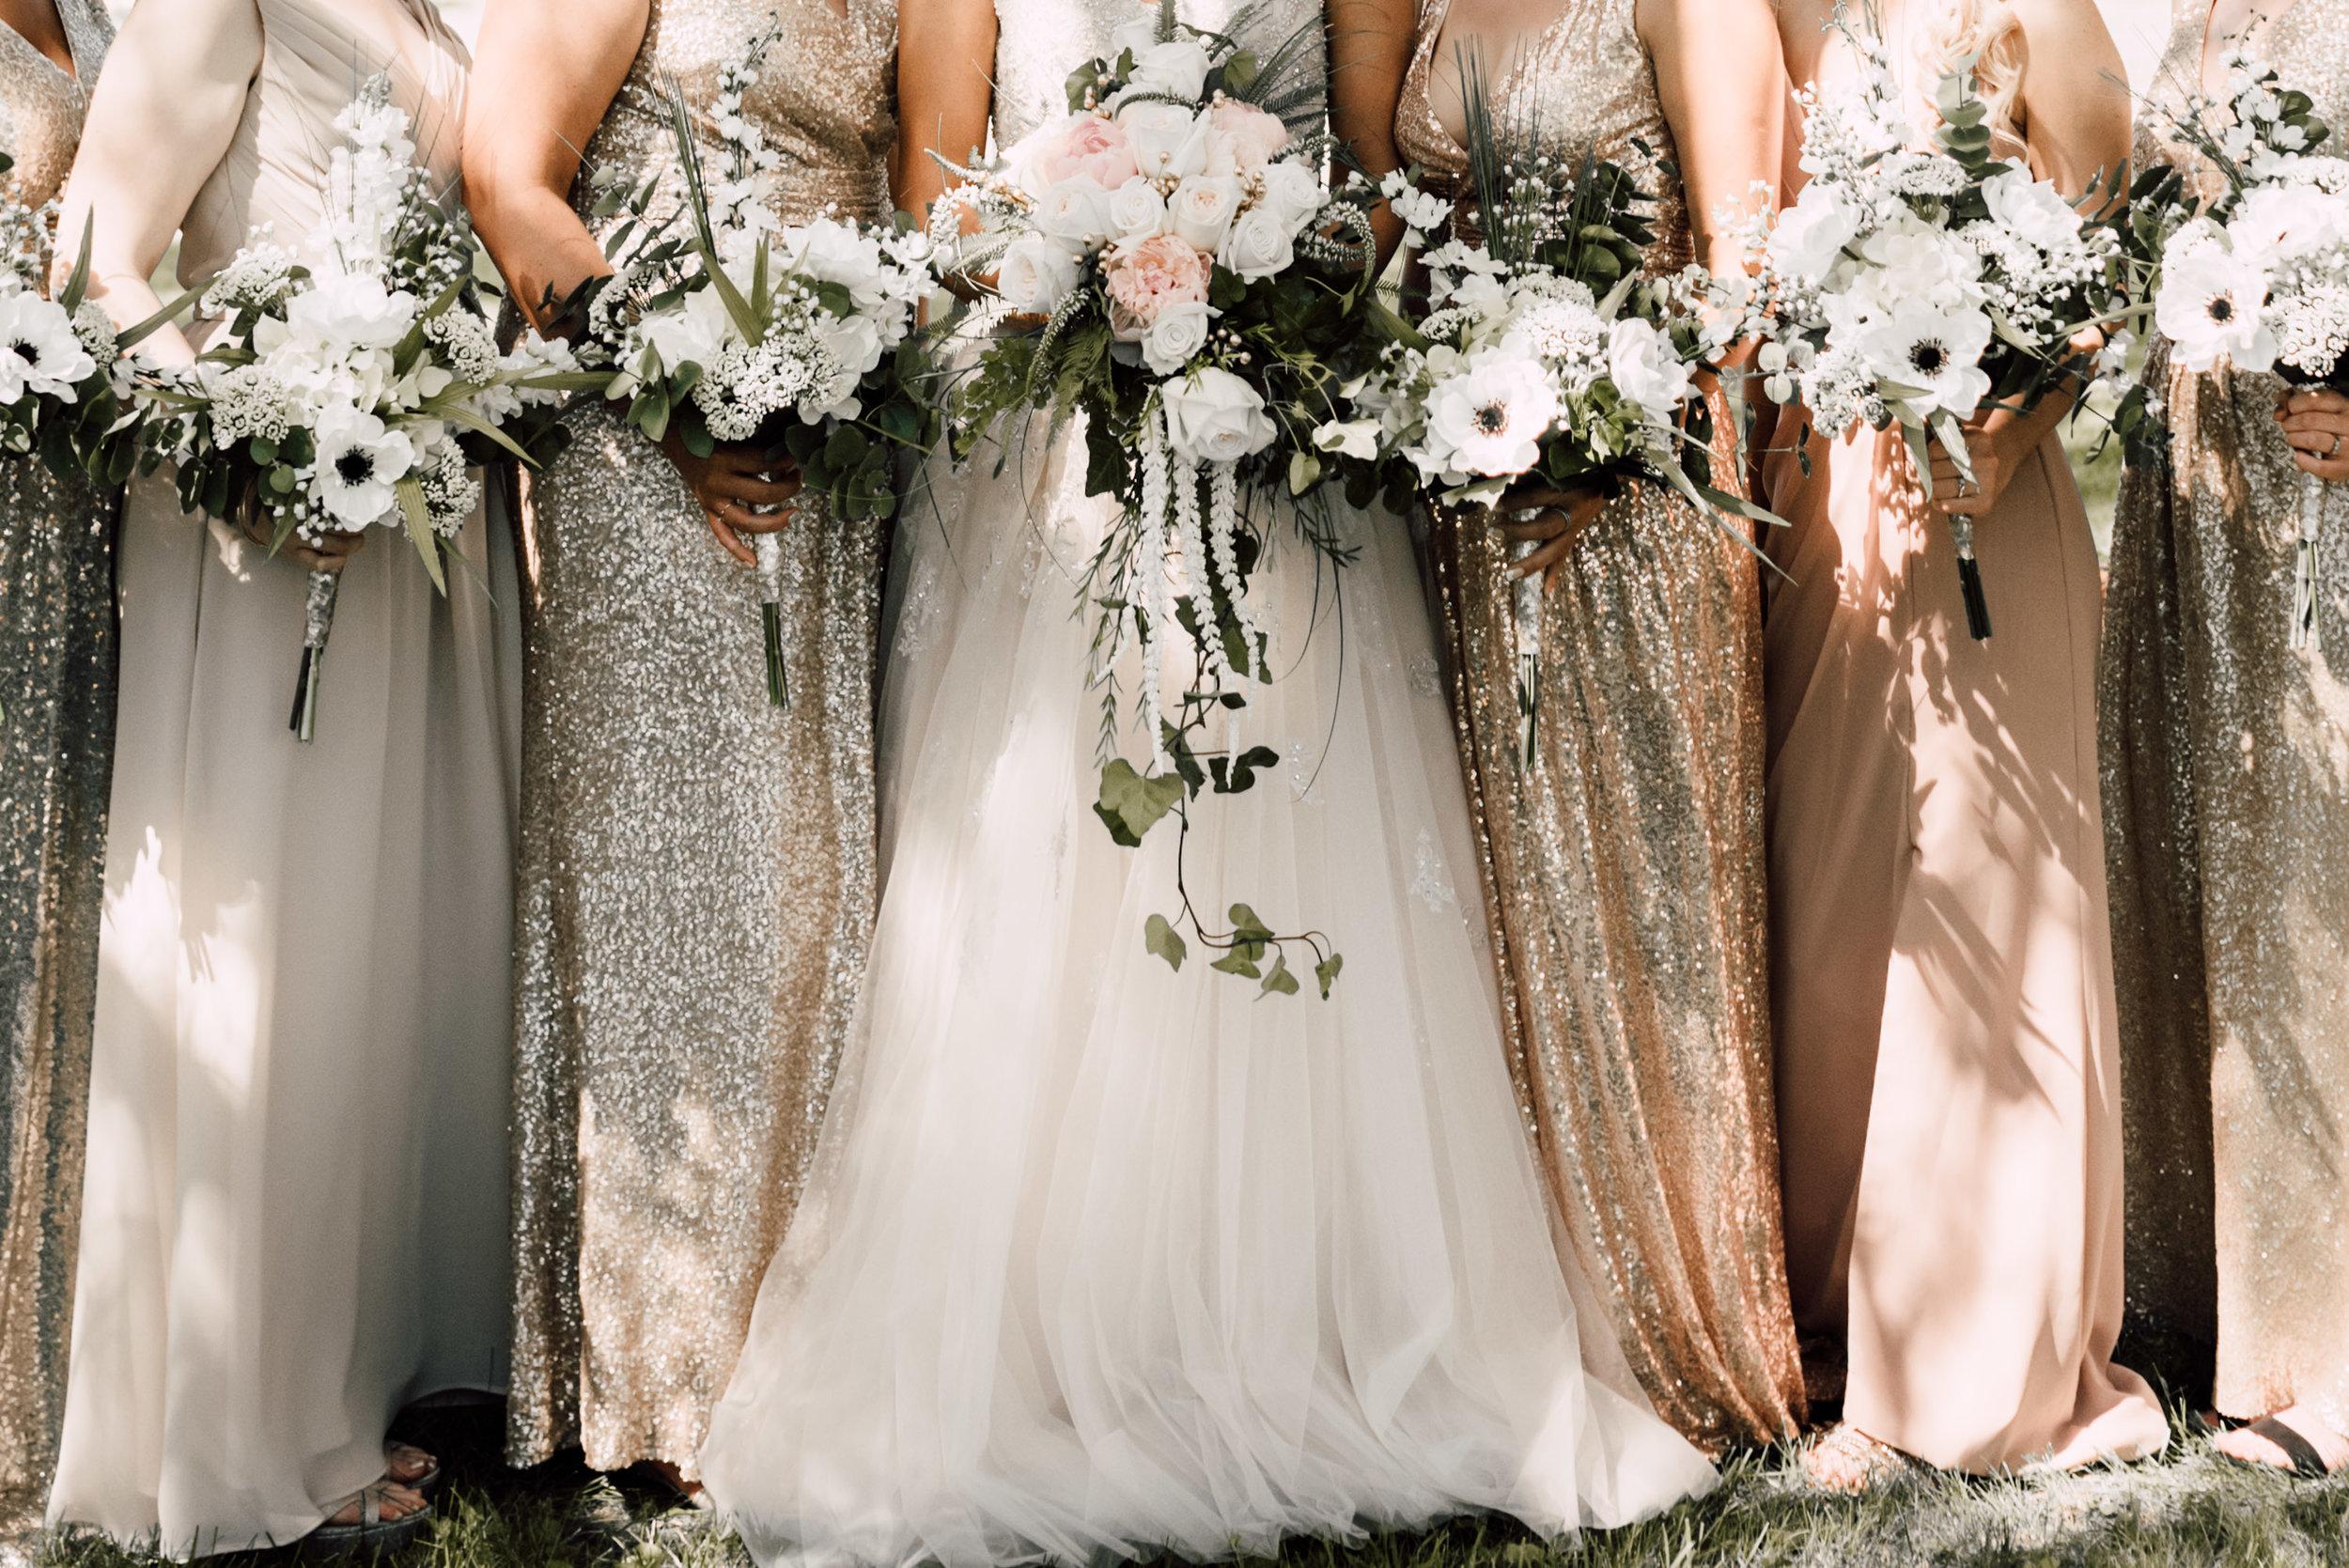 bridal portraits, bridesmaid flowers, ideas for bridesmaid bouquets